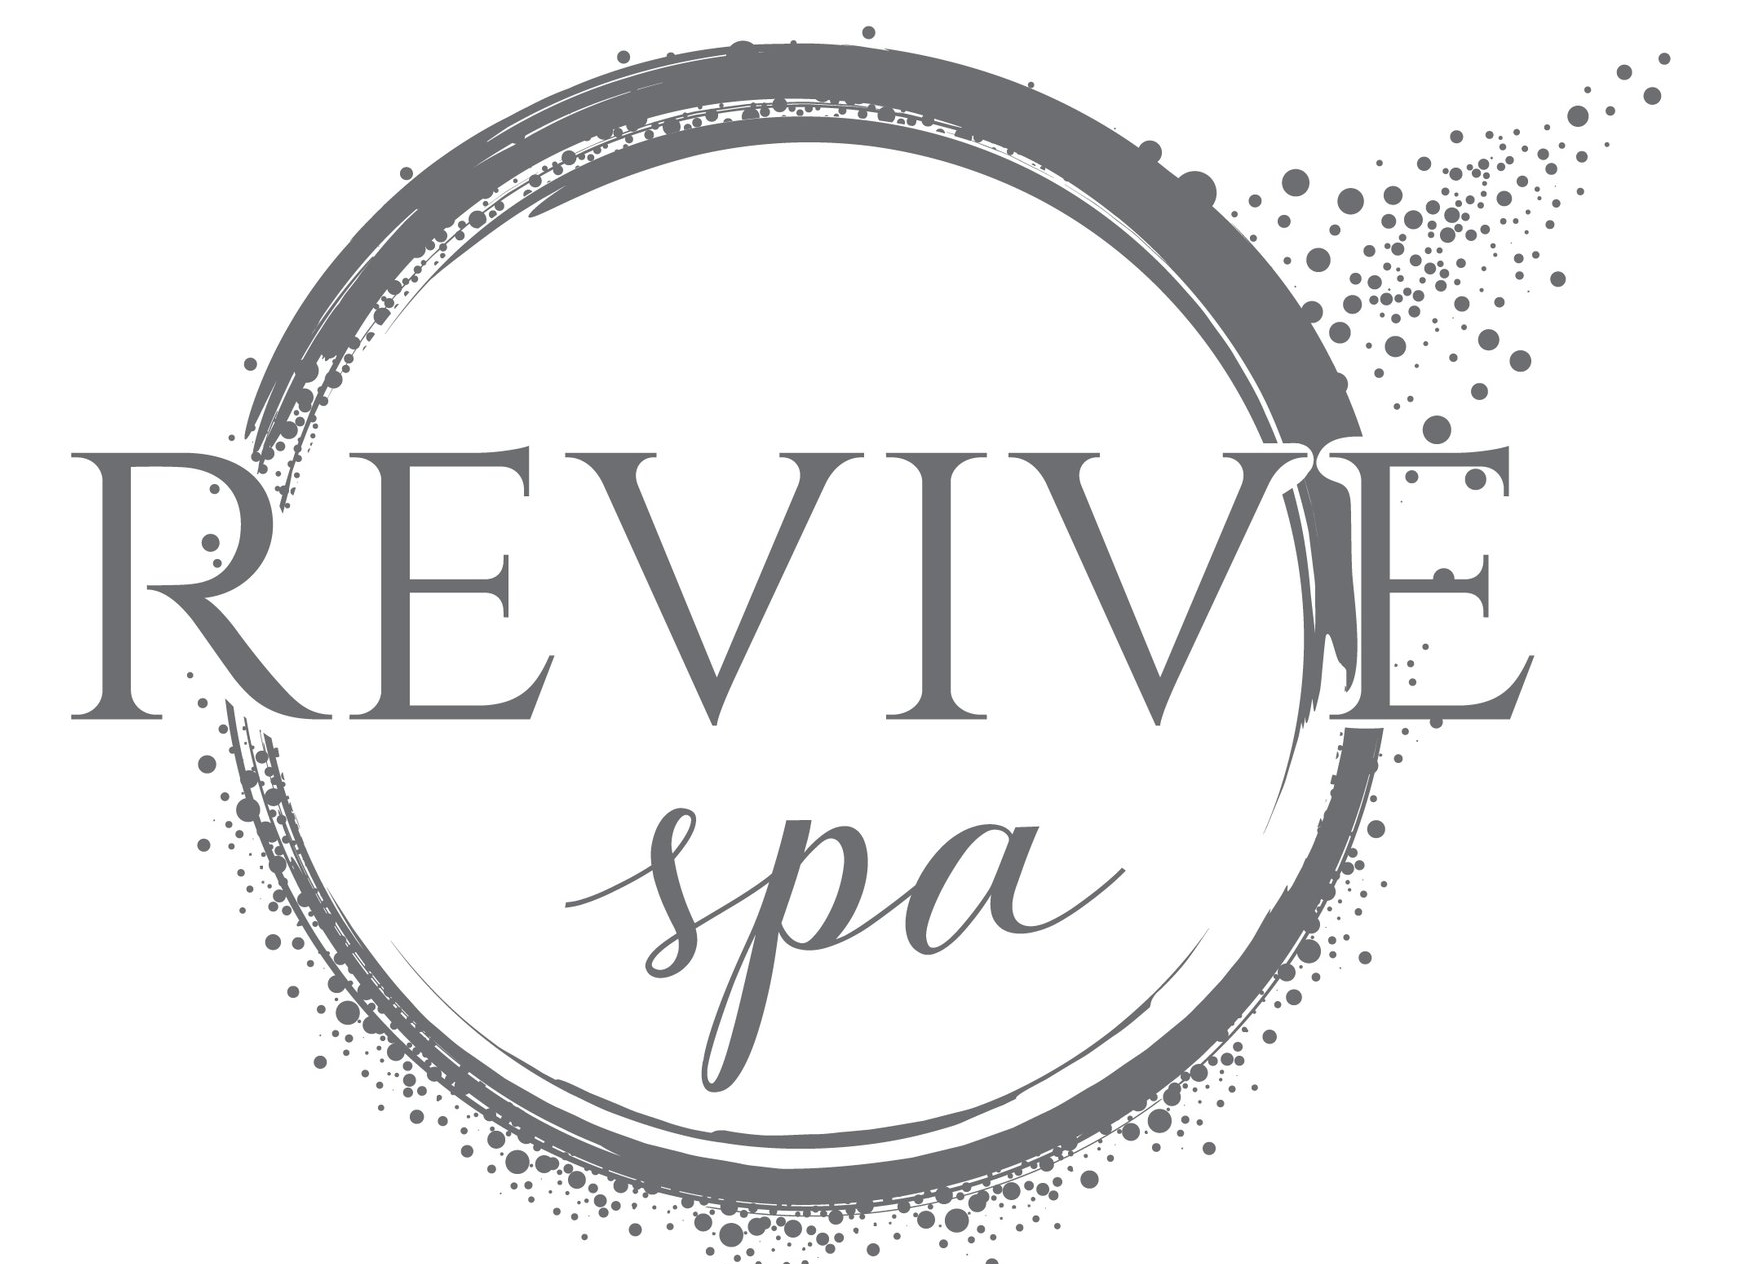 Revive Spa_one colored logo set.jpg